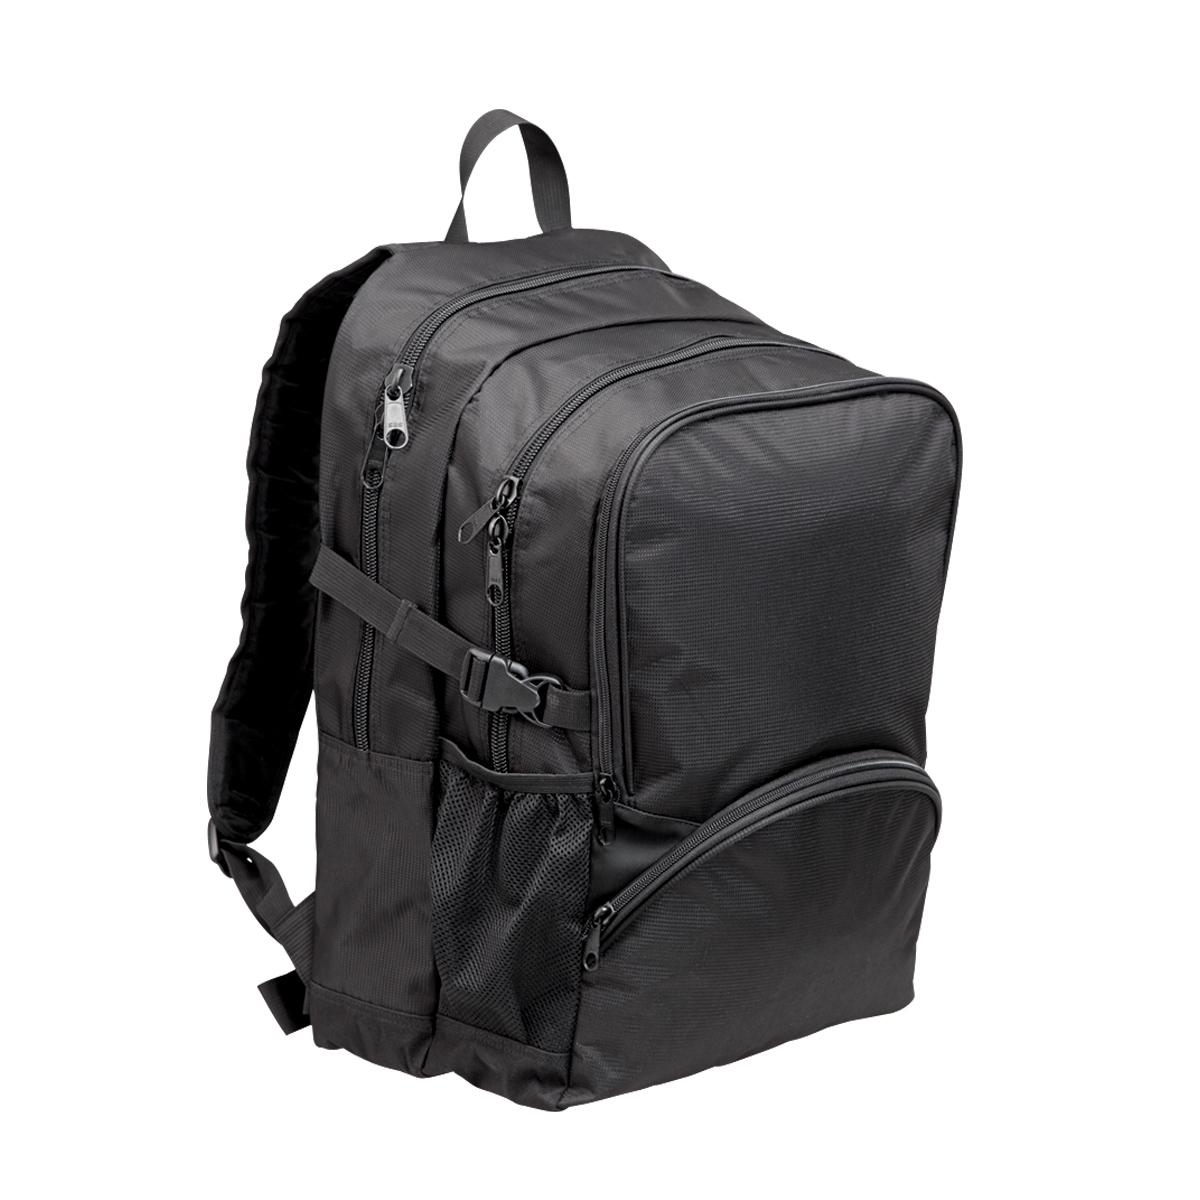 Titan Heavy Duty Backpack